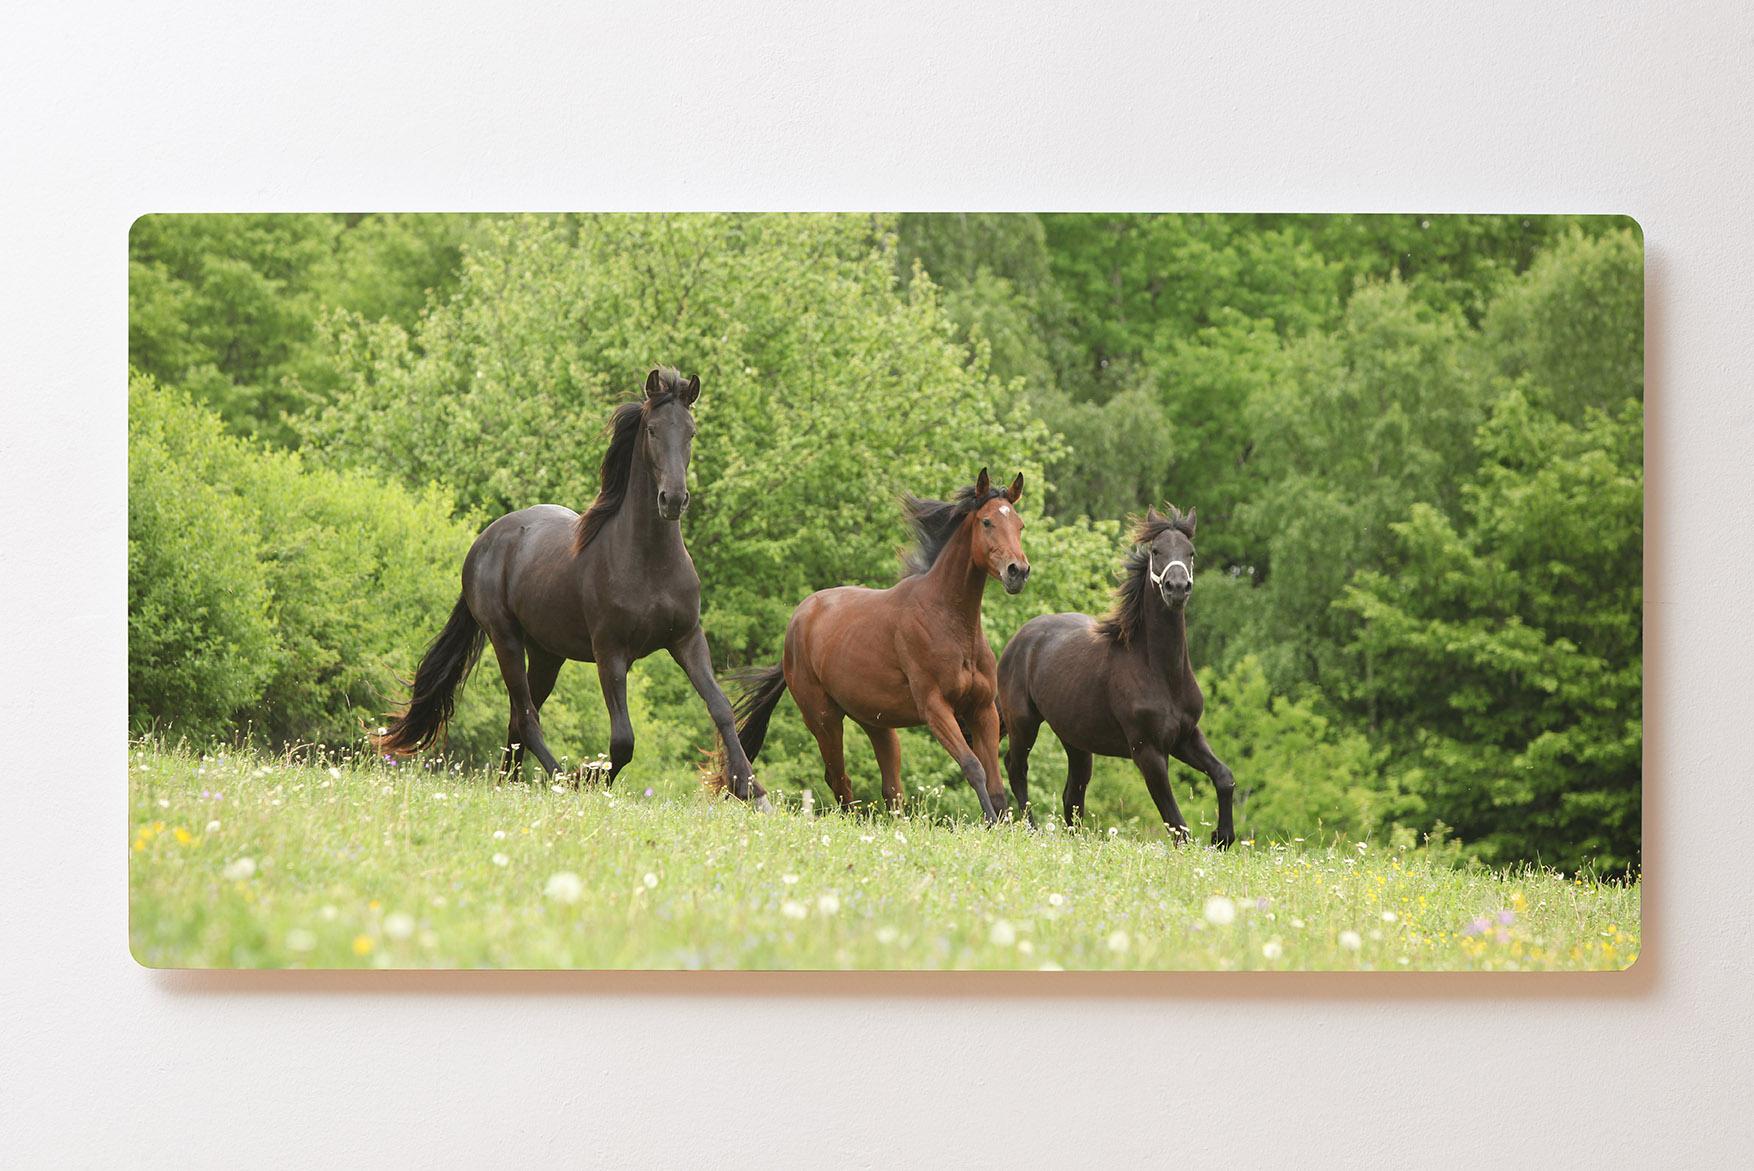 Magnettafel BACKLIGHT 120x60cm Motiv-Wandbild M103 Pferde